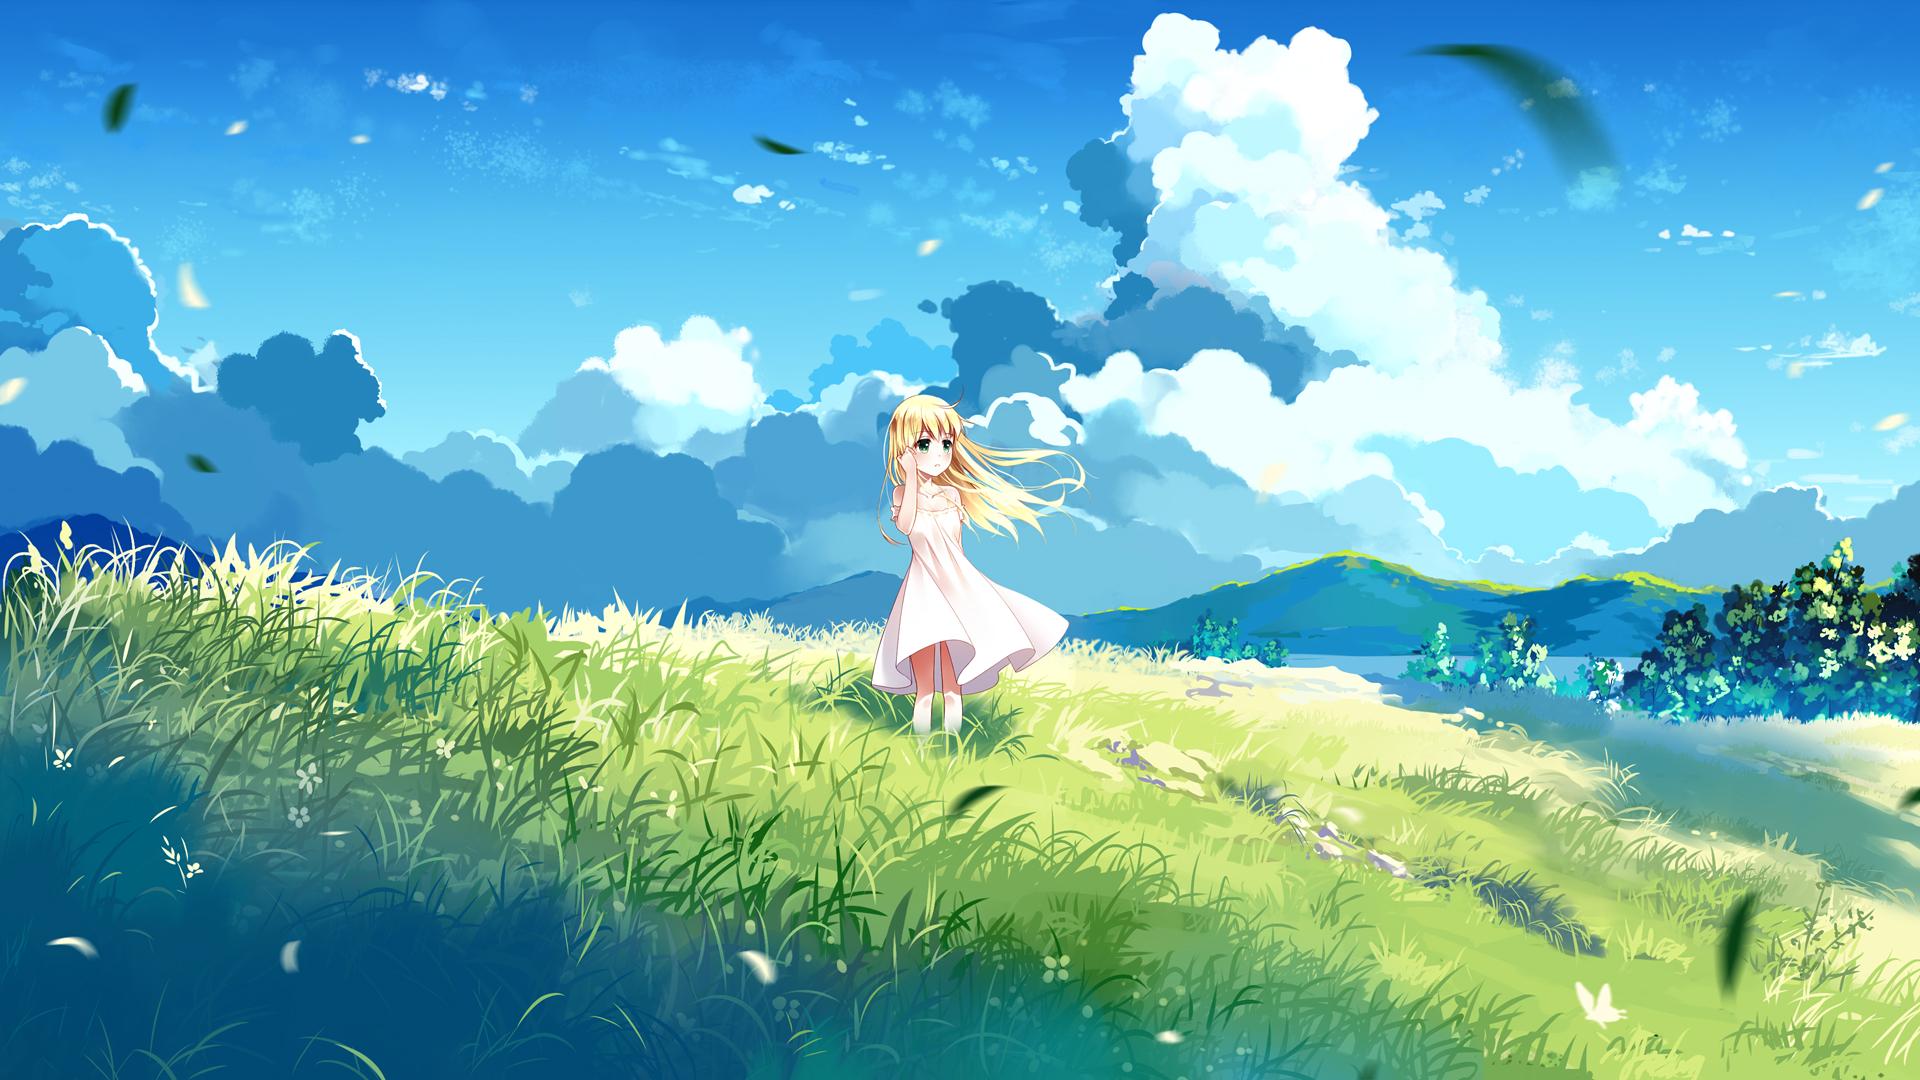 Anime 1920x1080 blonde clouds anime girls field nature sky dress anime cyan